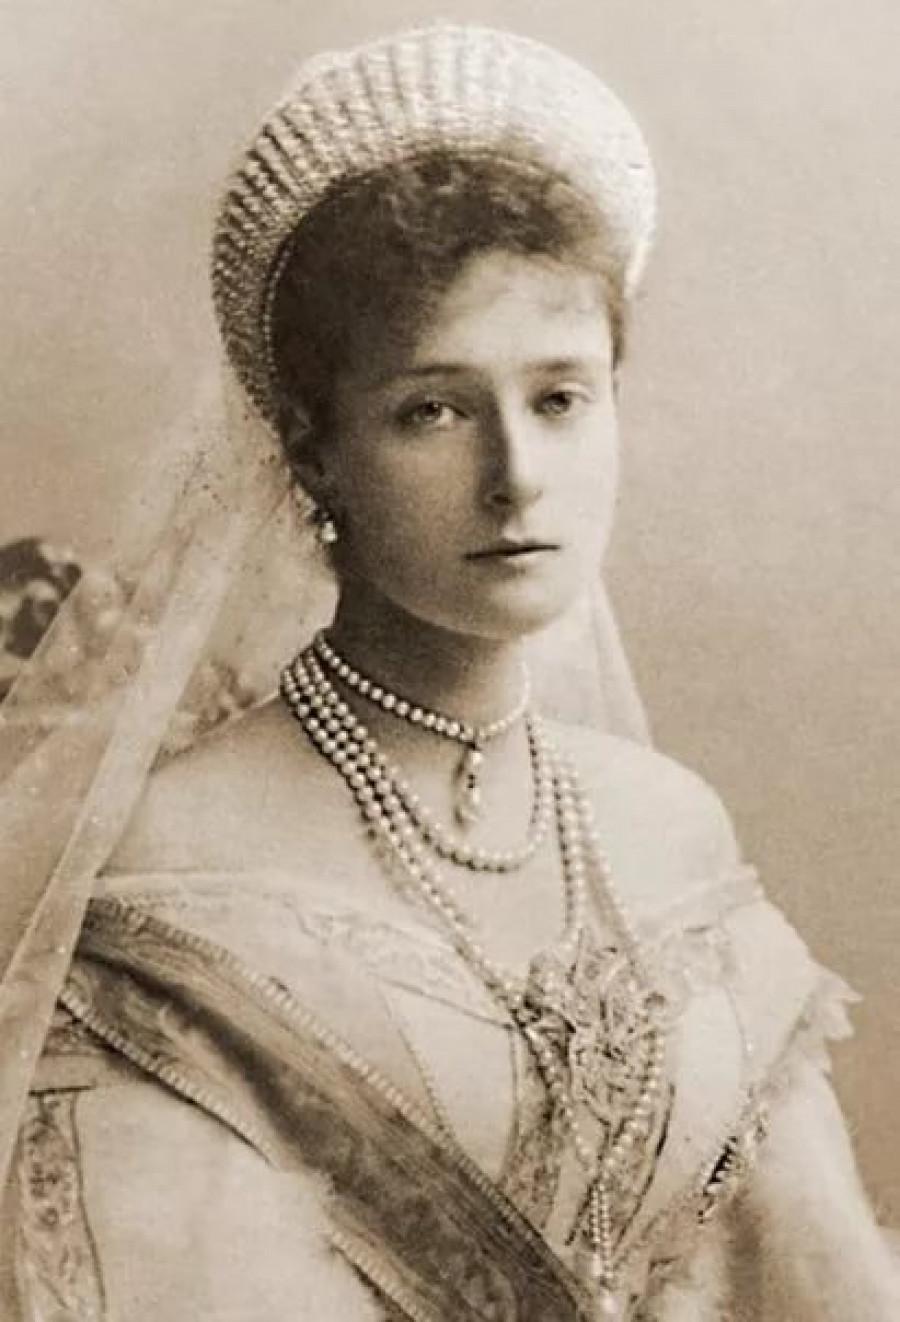 Александра Фёдоровна, урождённая принцесса Виктория Алиса Елена Луиза Беатриса Гессен-Дармштадтская.